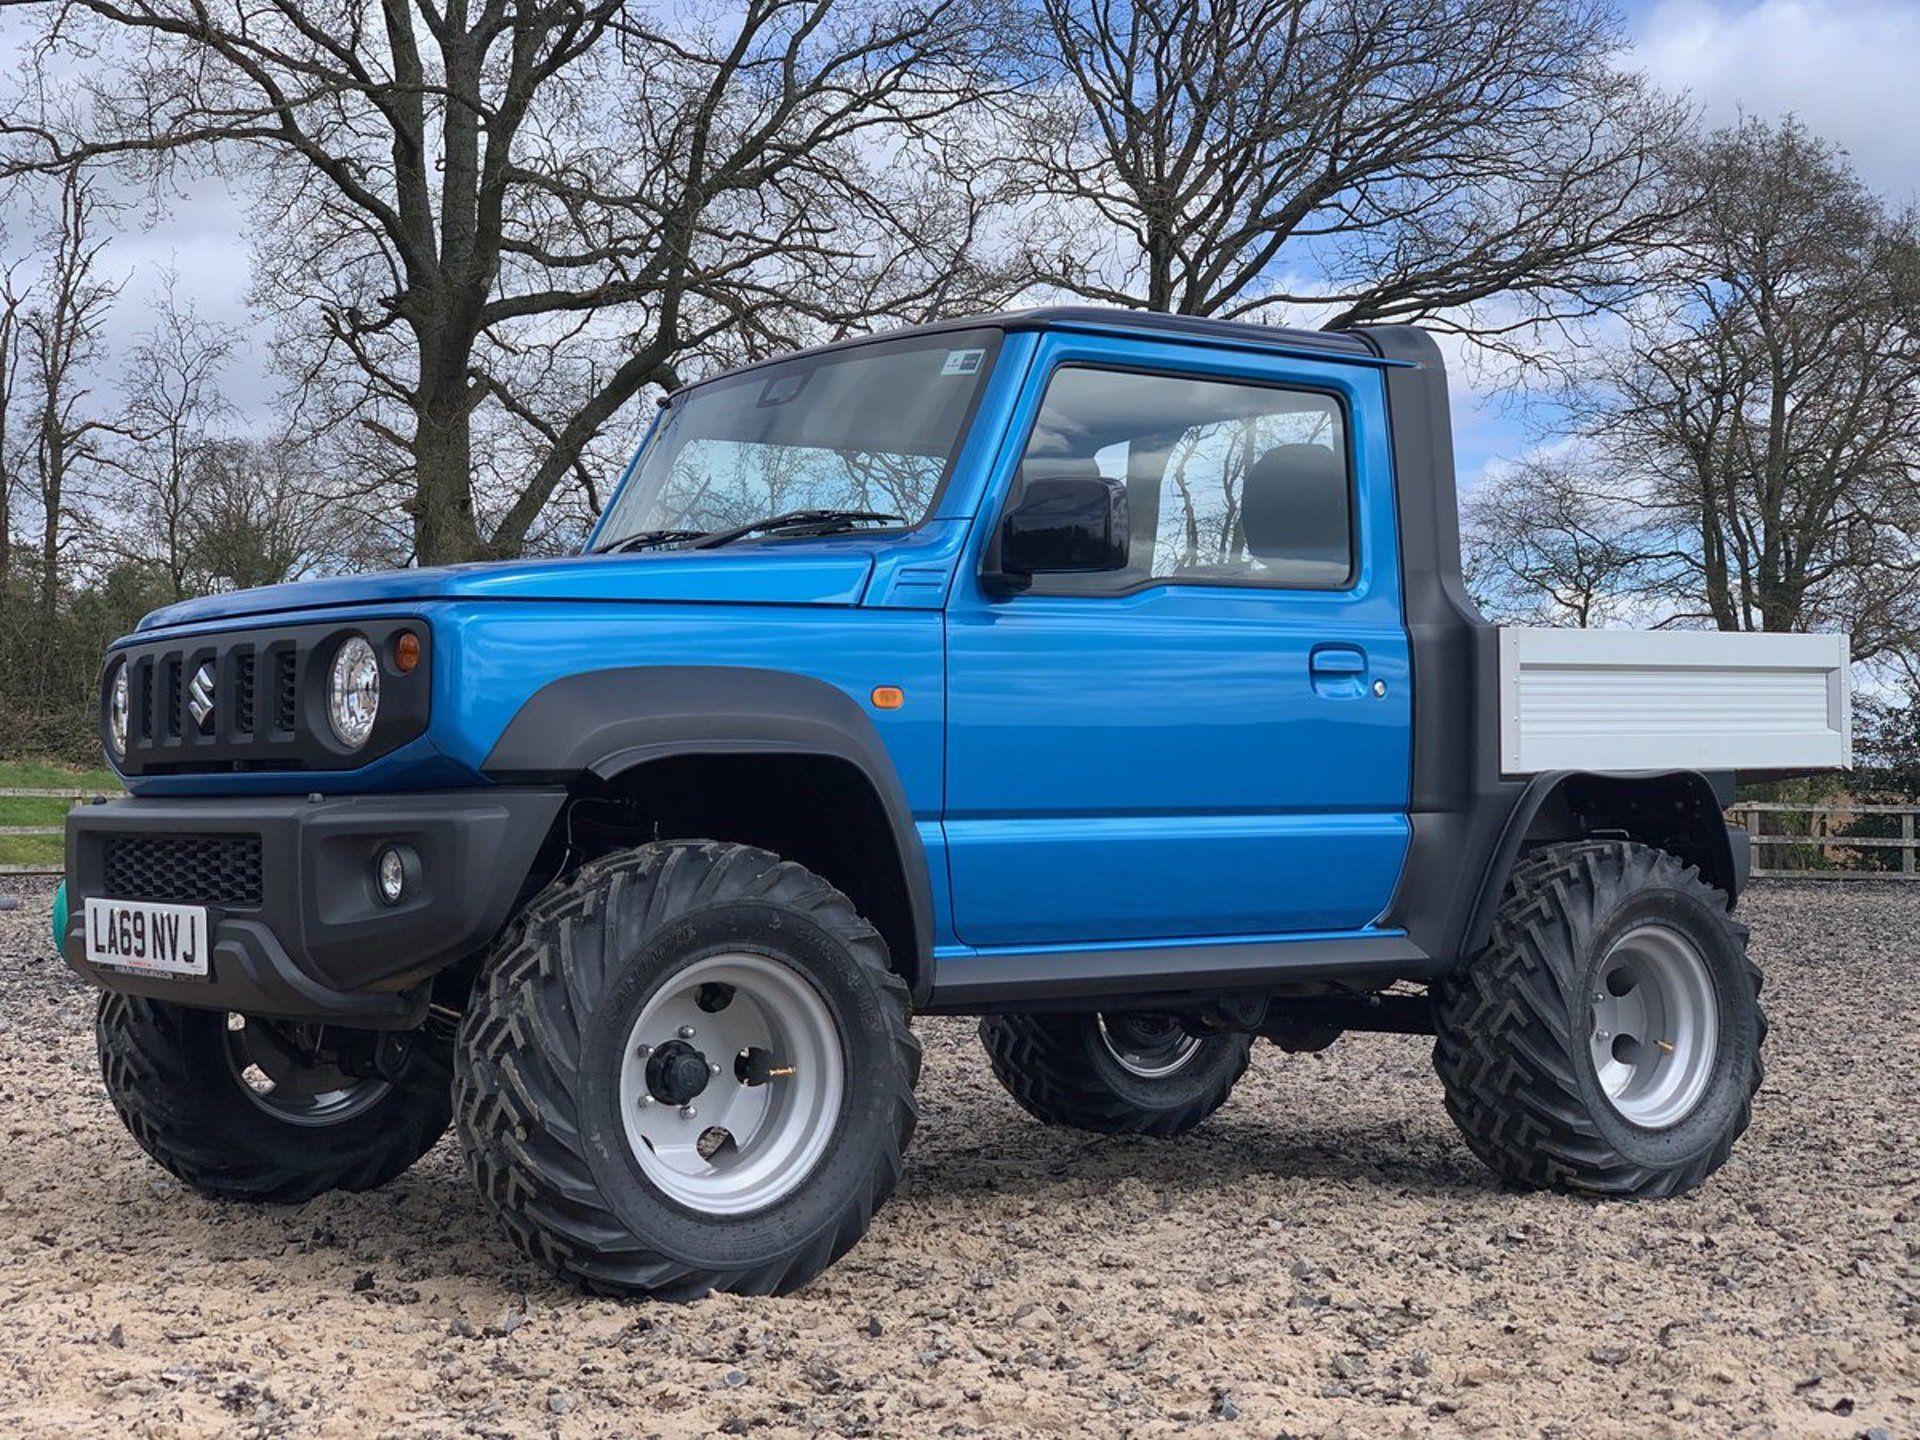 Suzuki_Jimny_pickup_0003